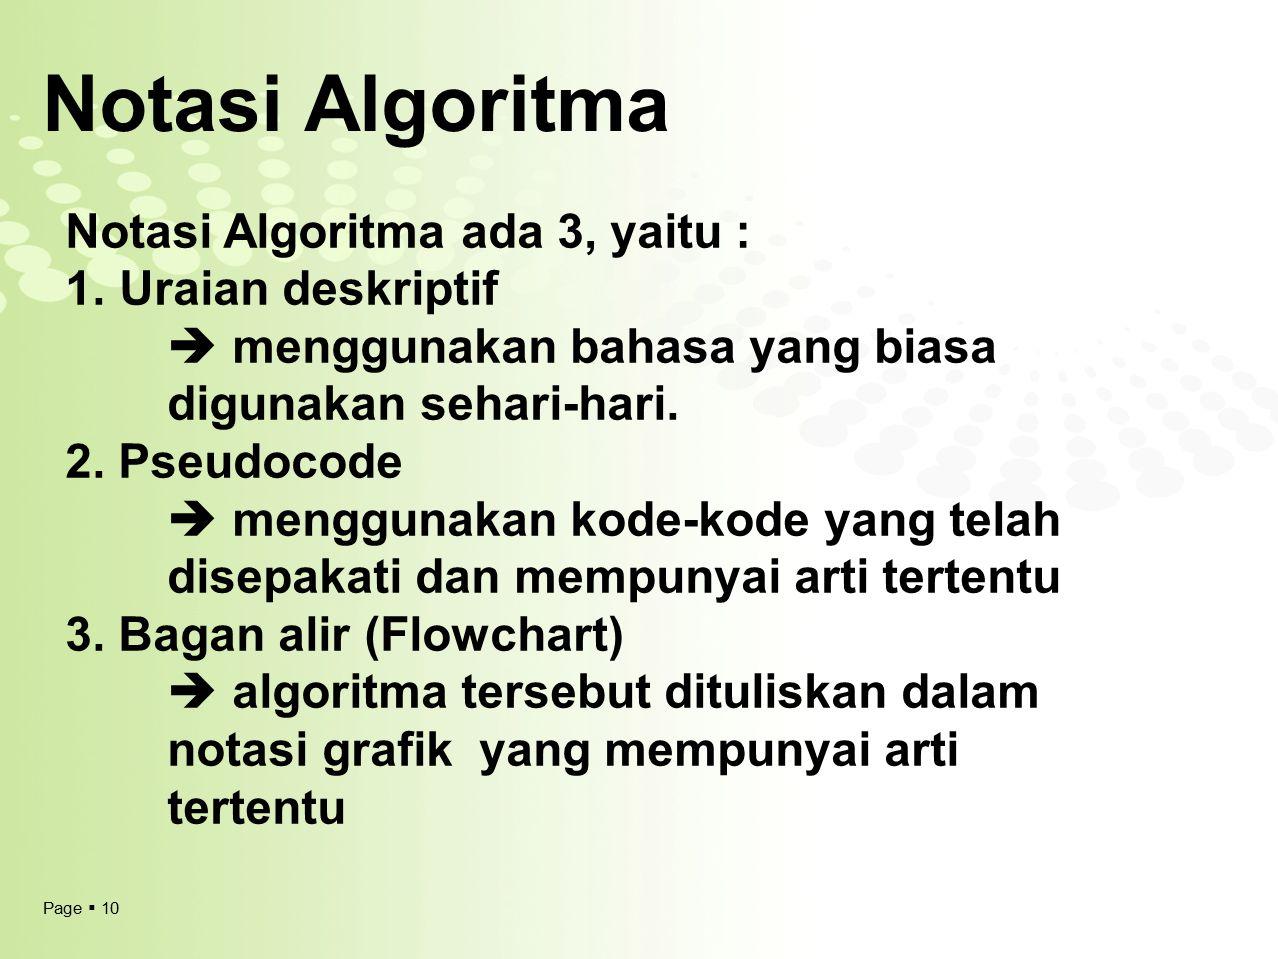 Page  10 Notasi Algoritma Notasi Algoritma ada 3, yaitu : 1.Uraian deskriptif  menggunakan bahasa yang biasa digunakan sehari-hari. 2. Pseudocode 